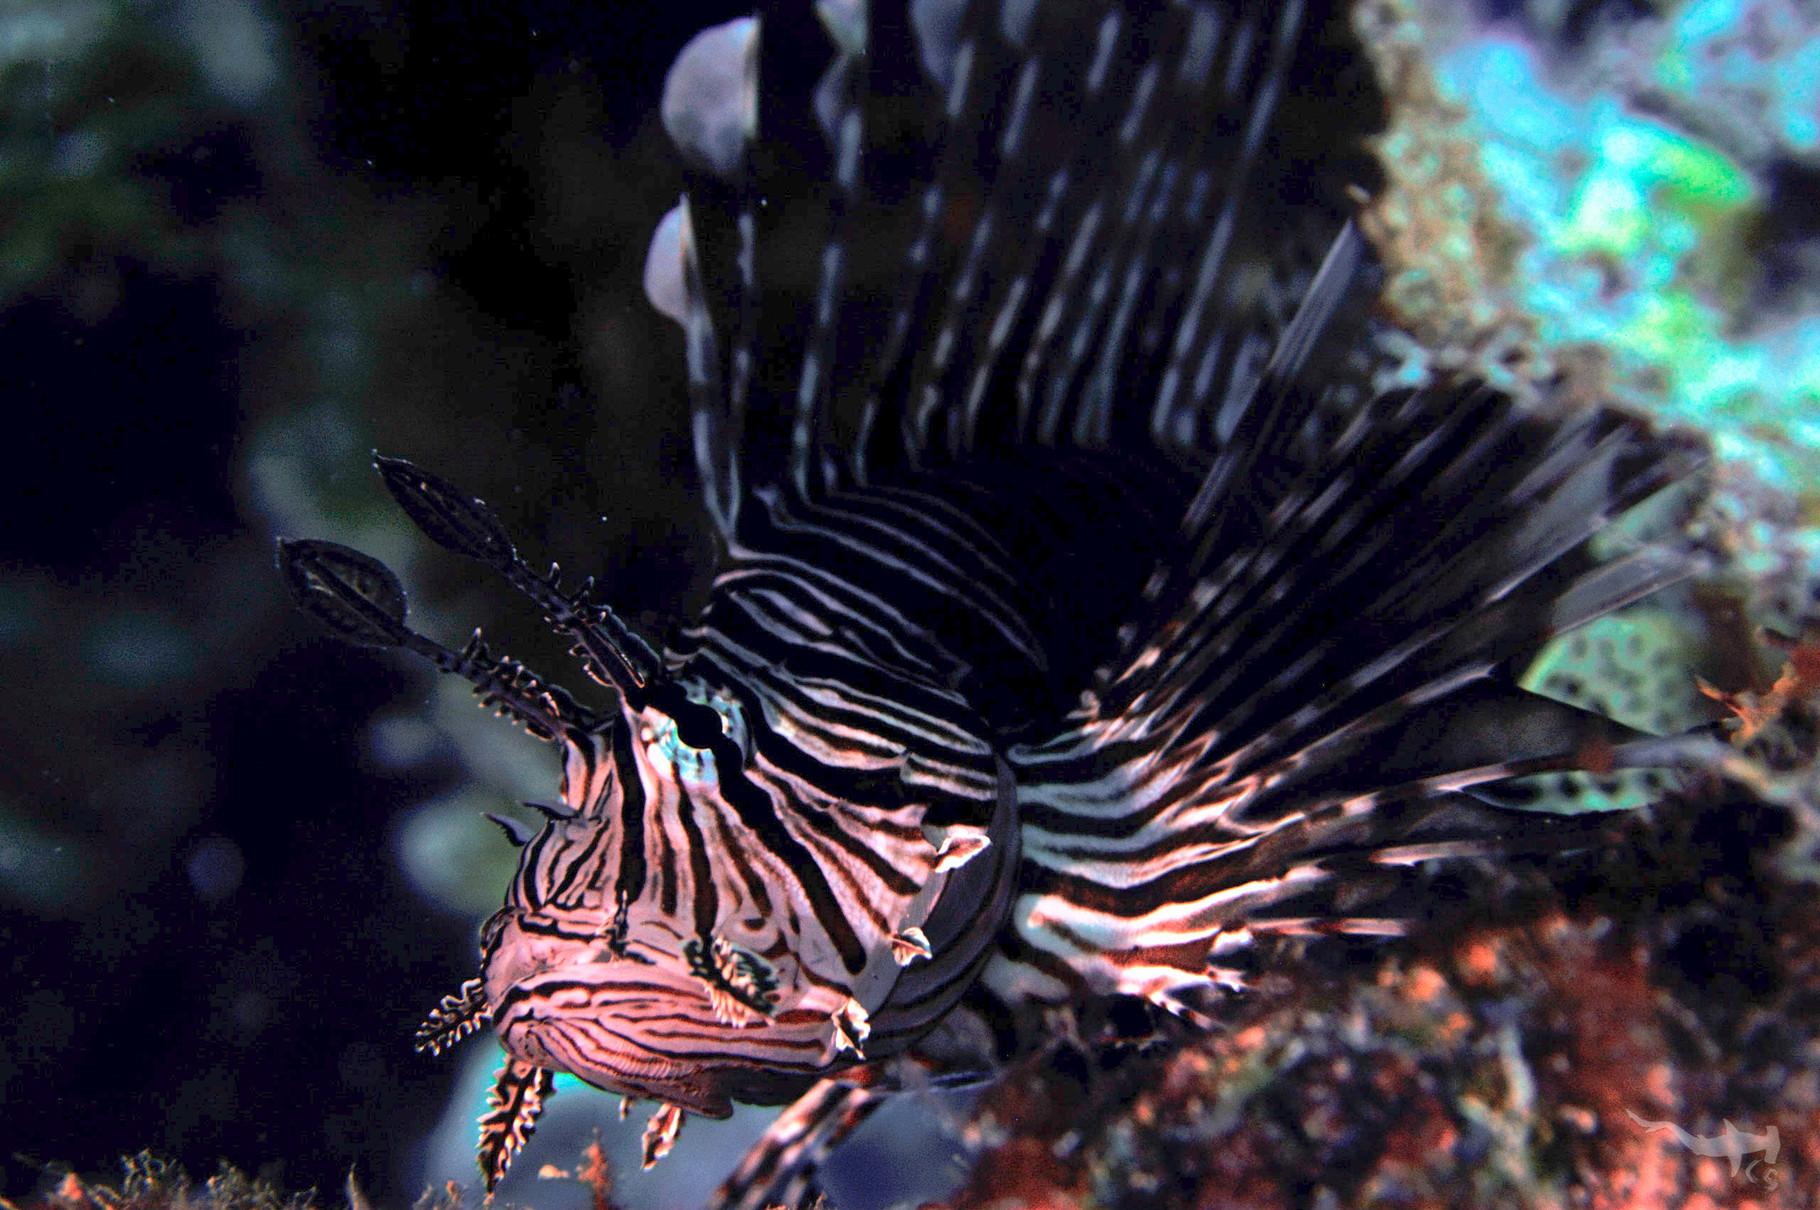 Lionfish - - Curaçao/Caribbean Sea